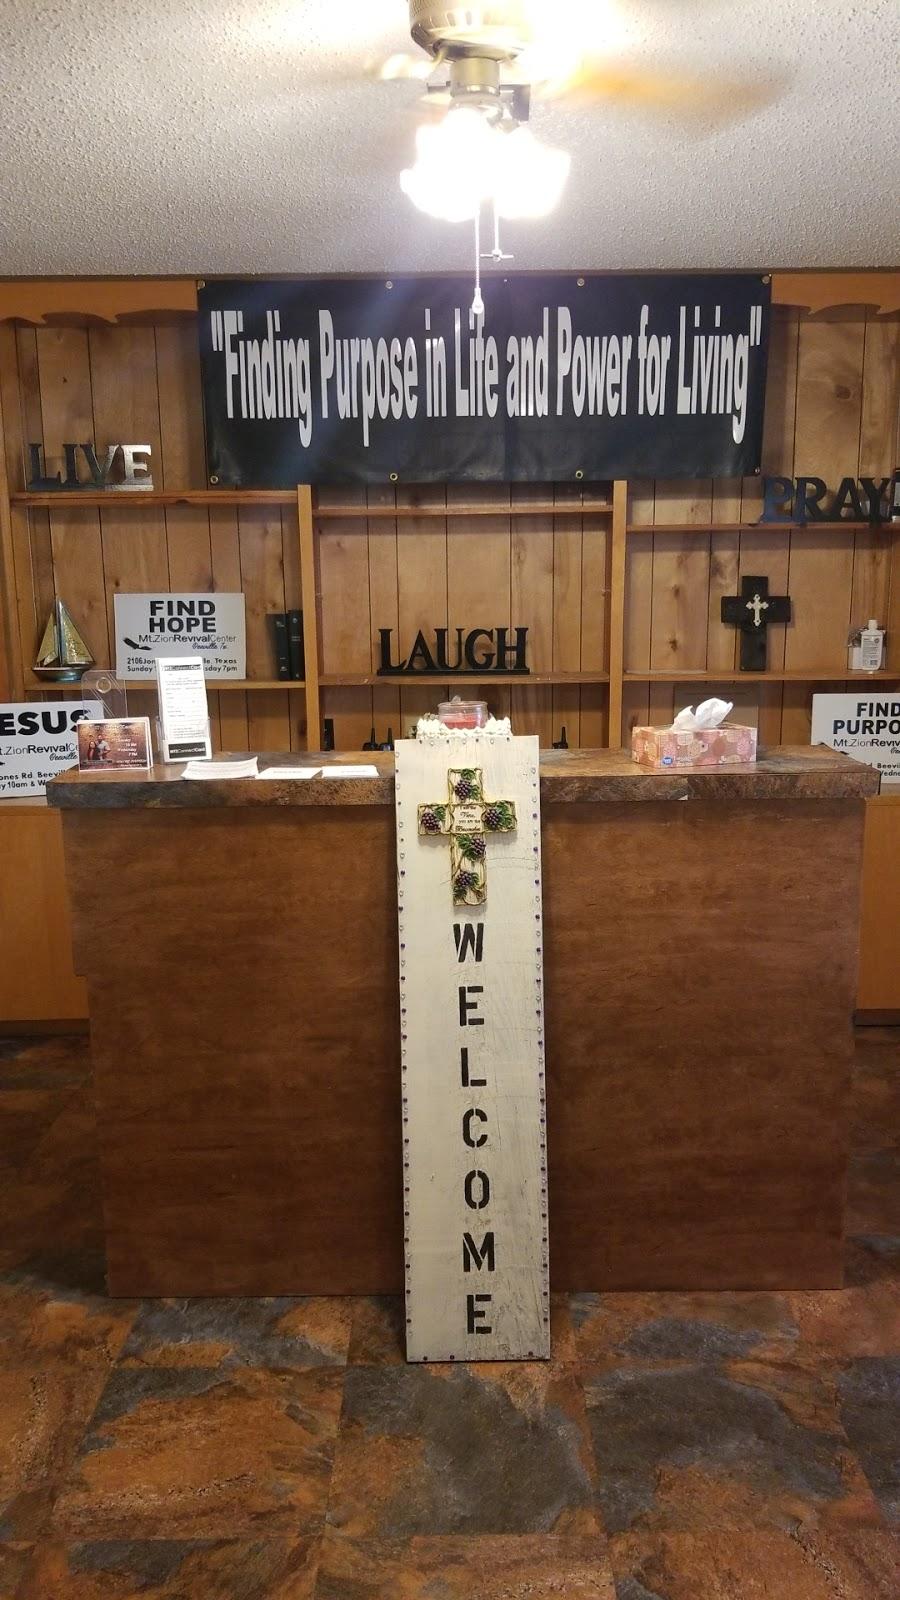 Mt. Zion Revival Center - church  | Photo 1 of 7 | Address: 2106 Jones Rd, Beeville, TX 78102, USA | Phone: (361) 343-5622